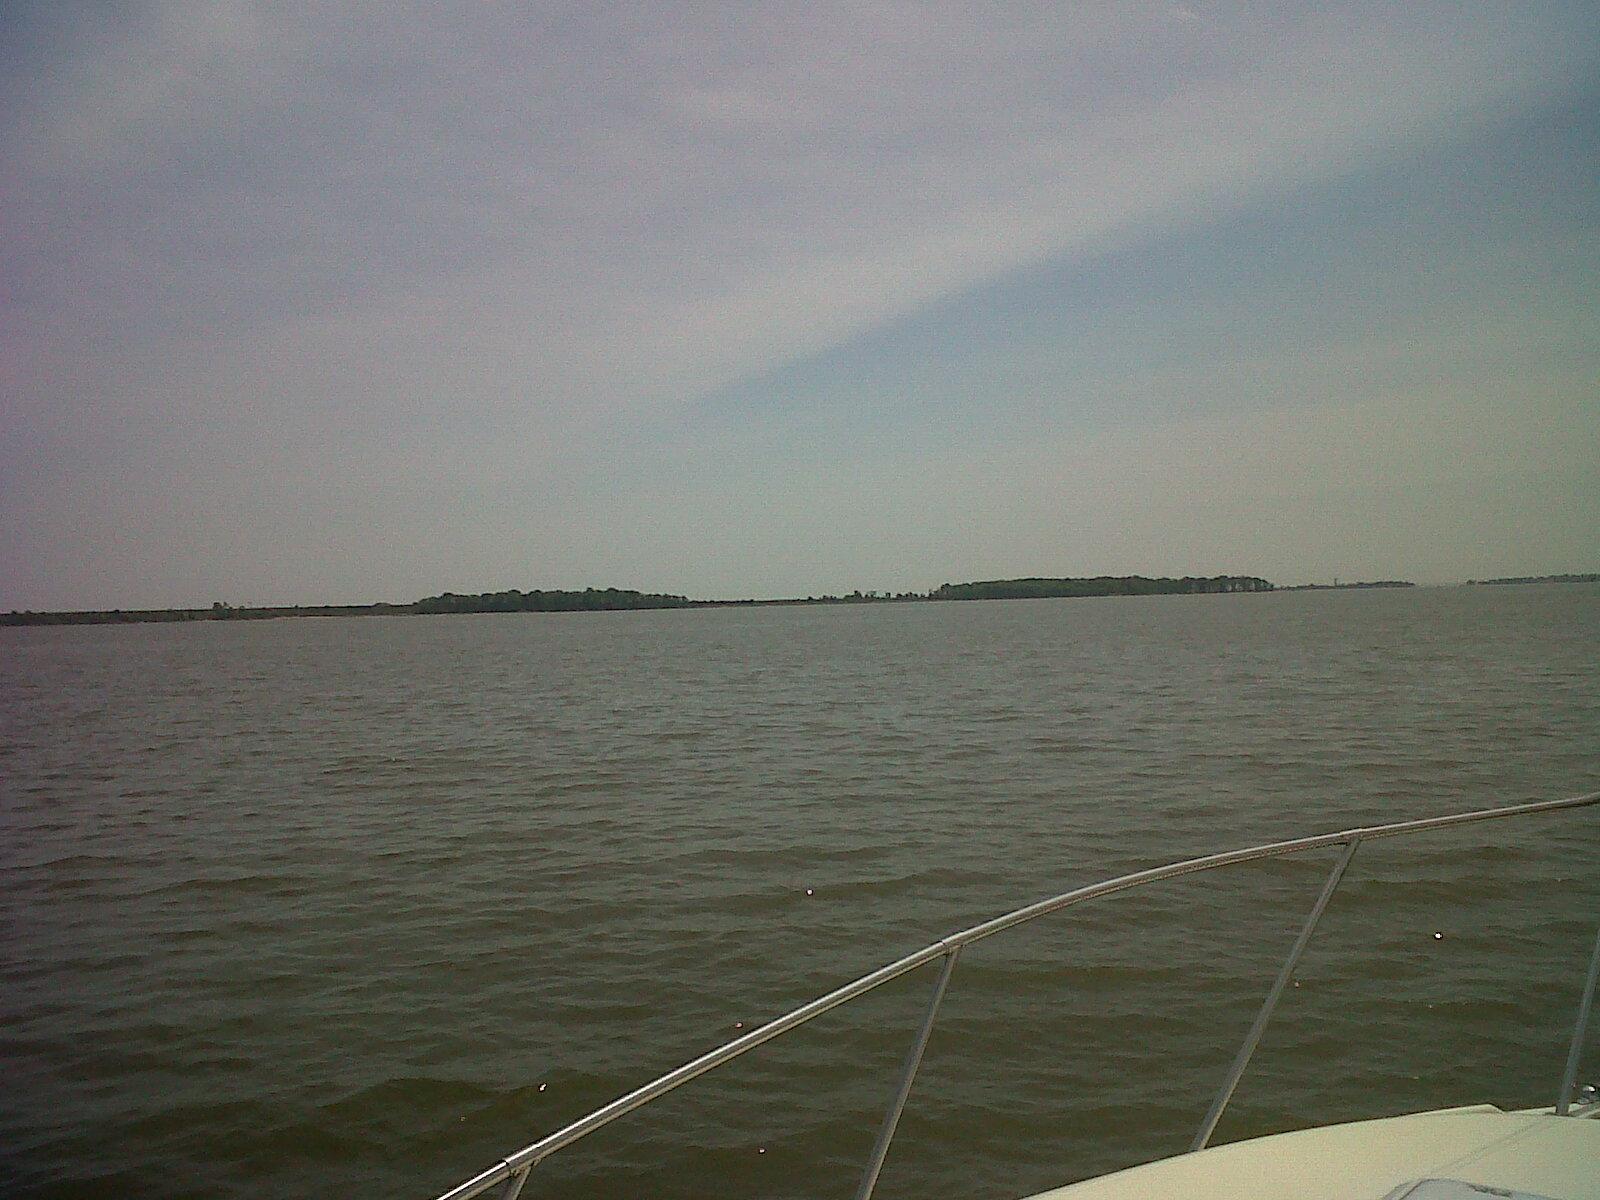 Pooles Island